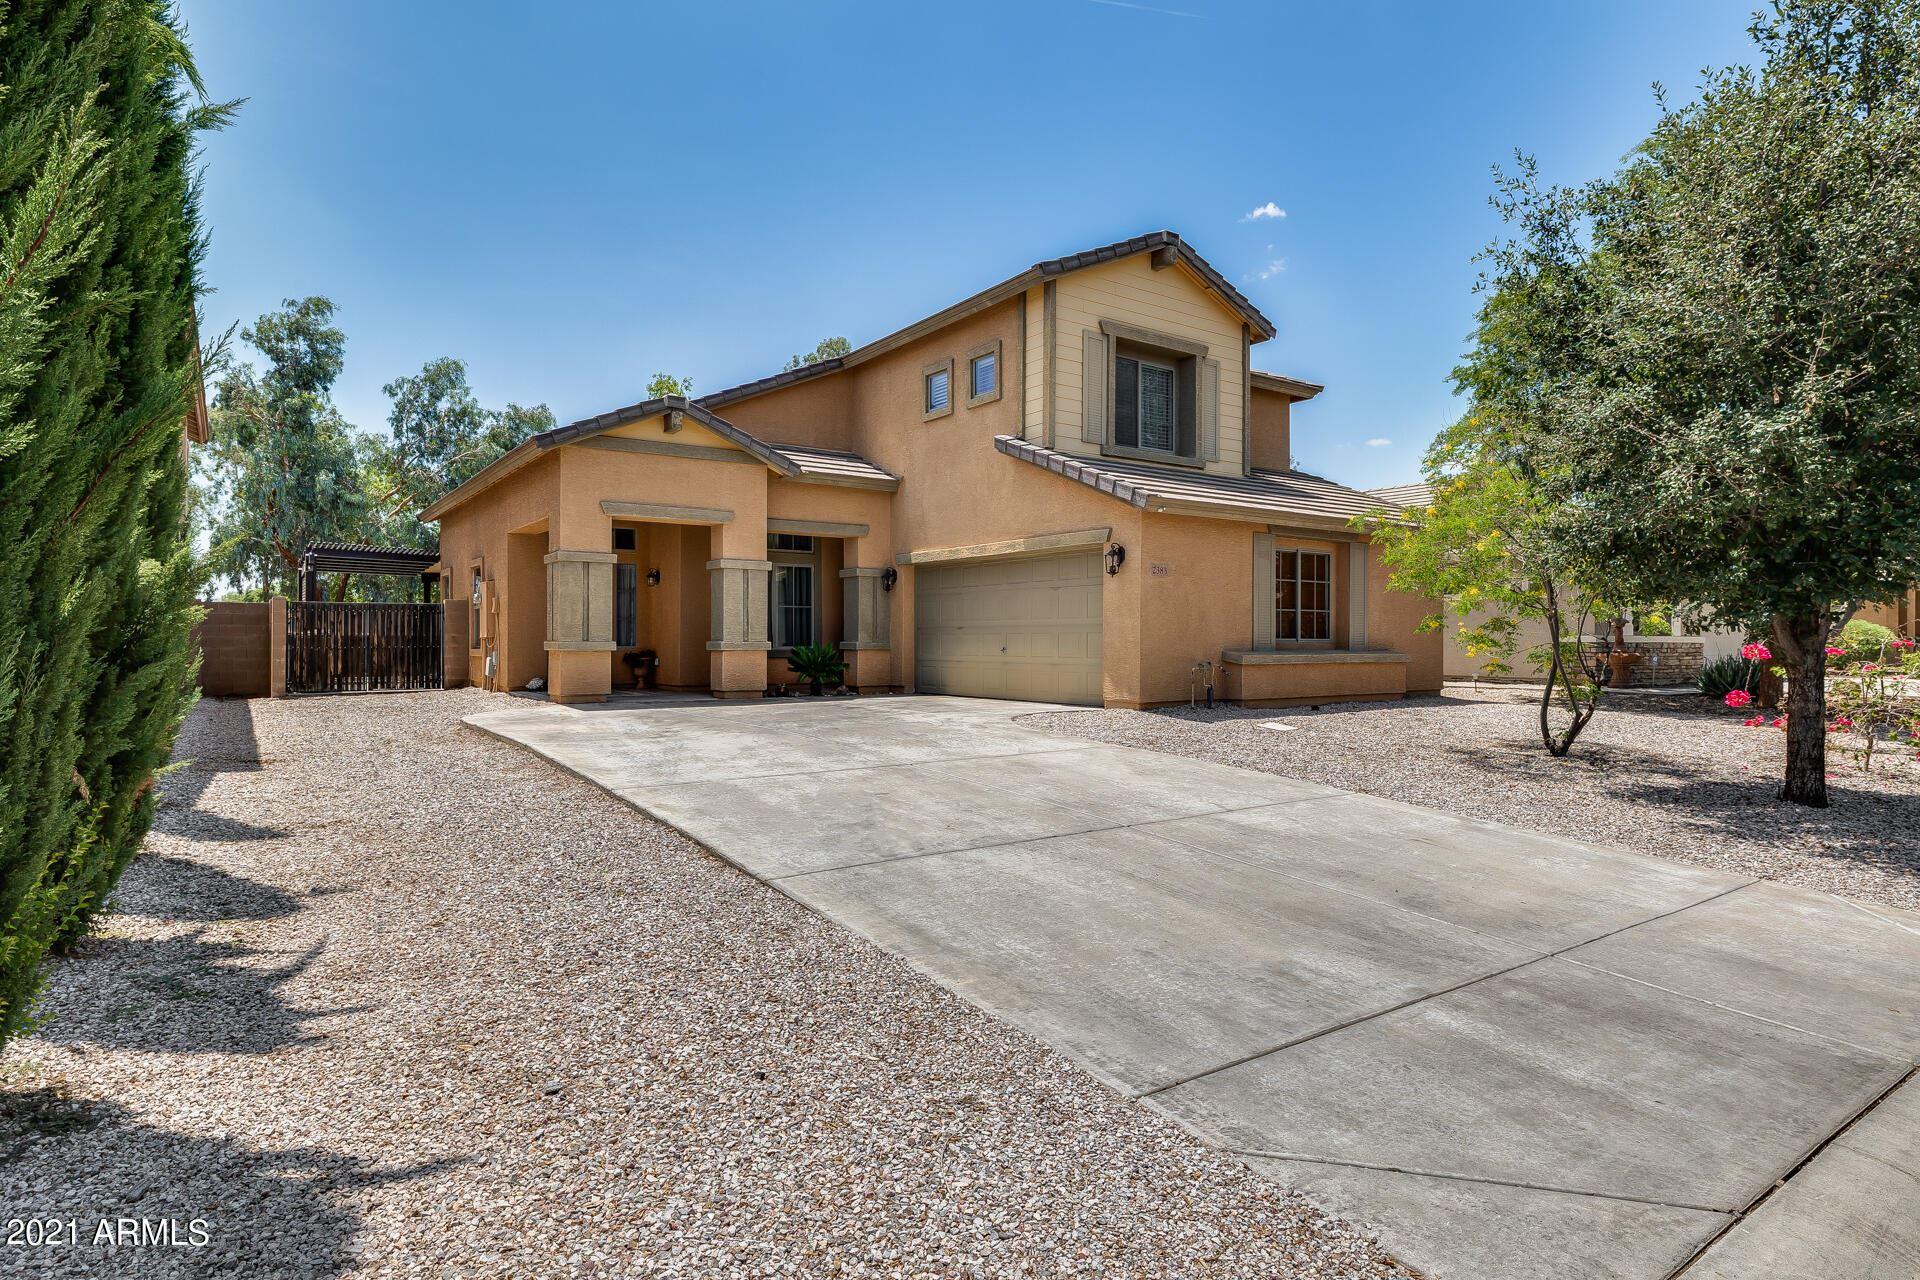 Photo of 2383 W SILVER STREAK Way, Queen Creek, AZ 85142 (MLS # 6268195)